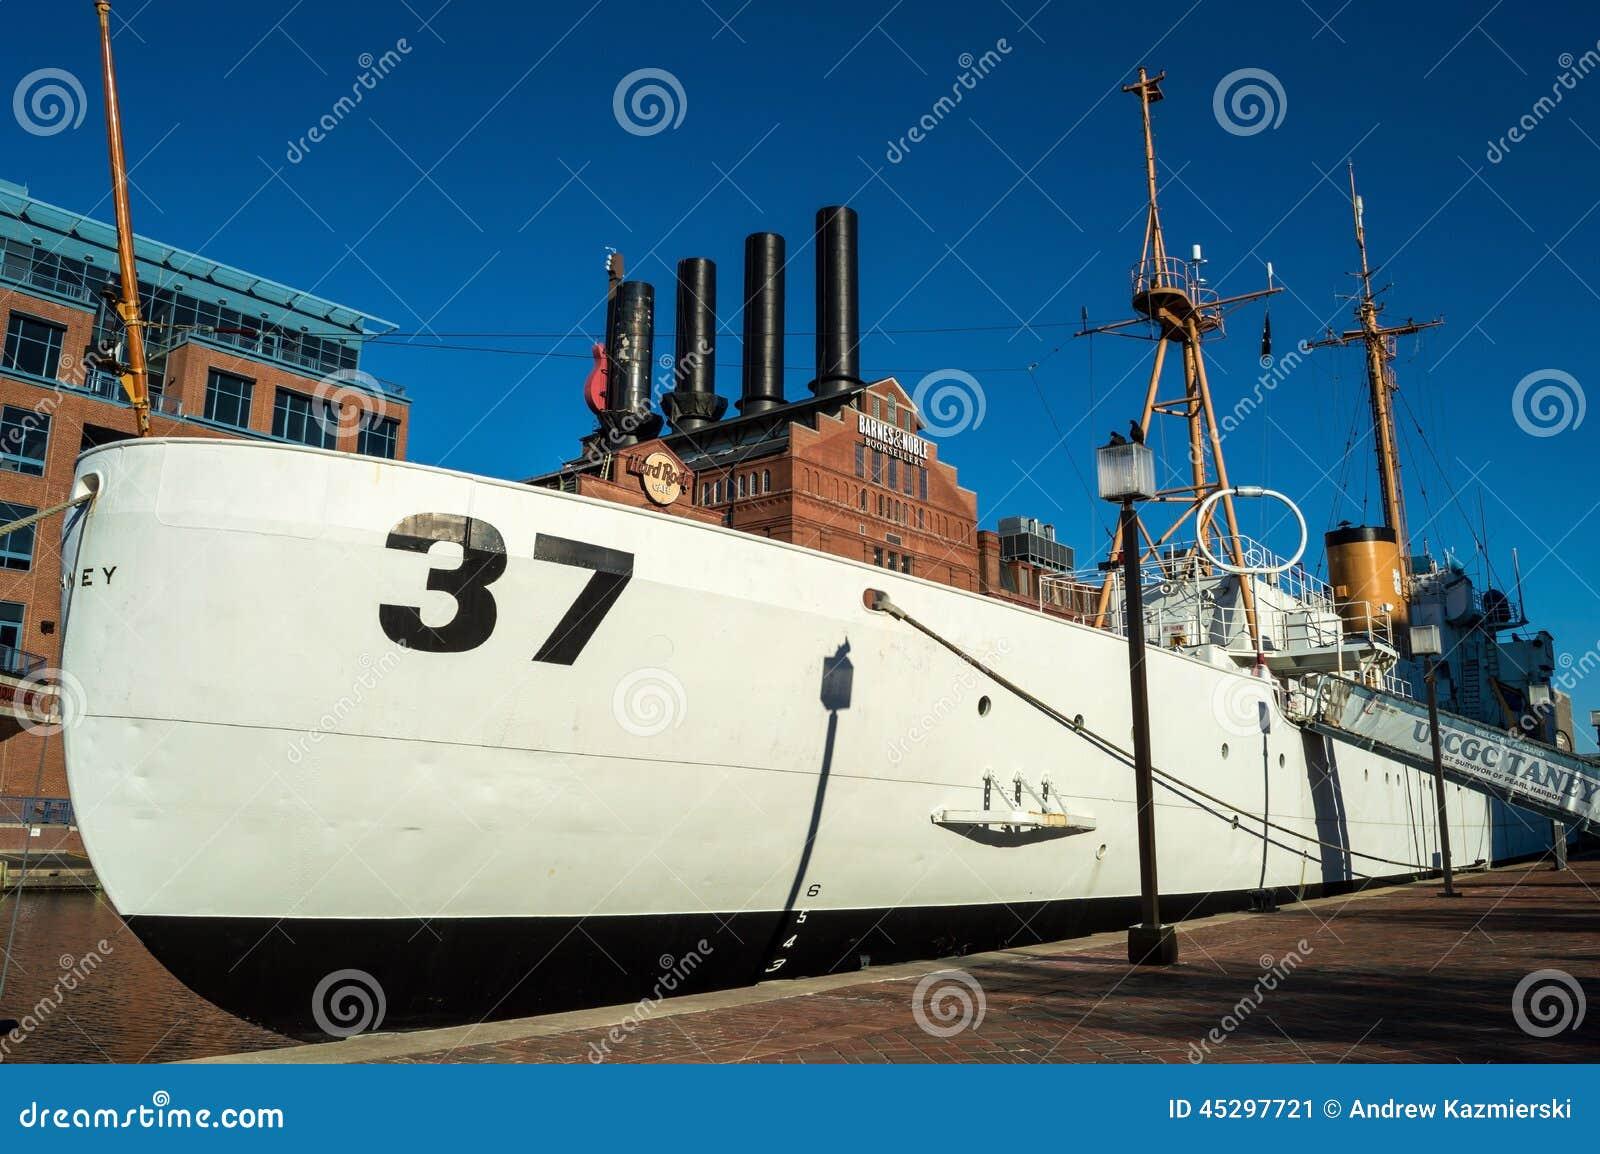 Marketing plan – National maritime museum Essay